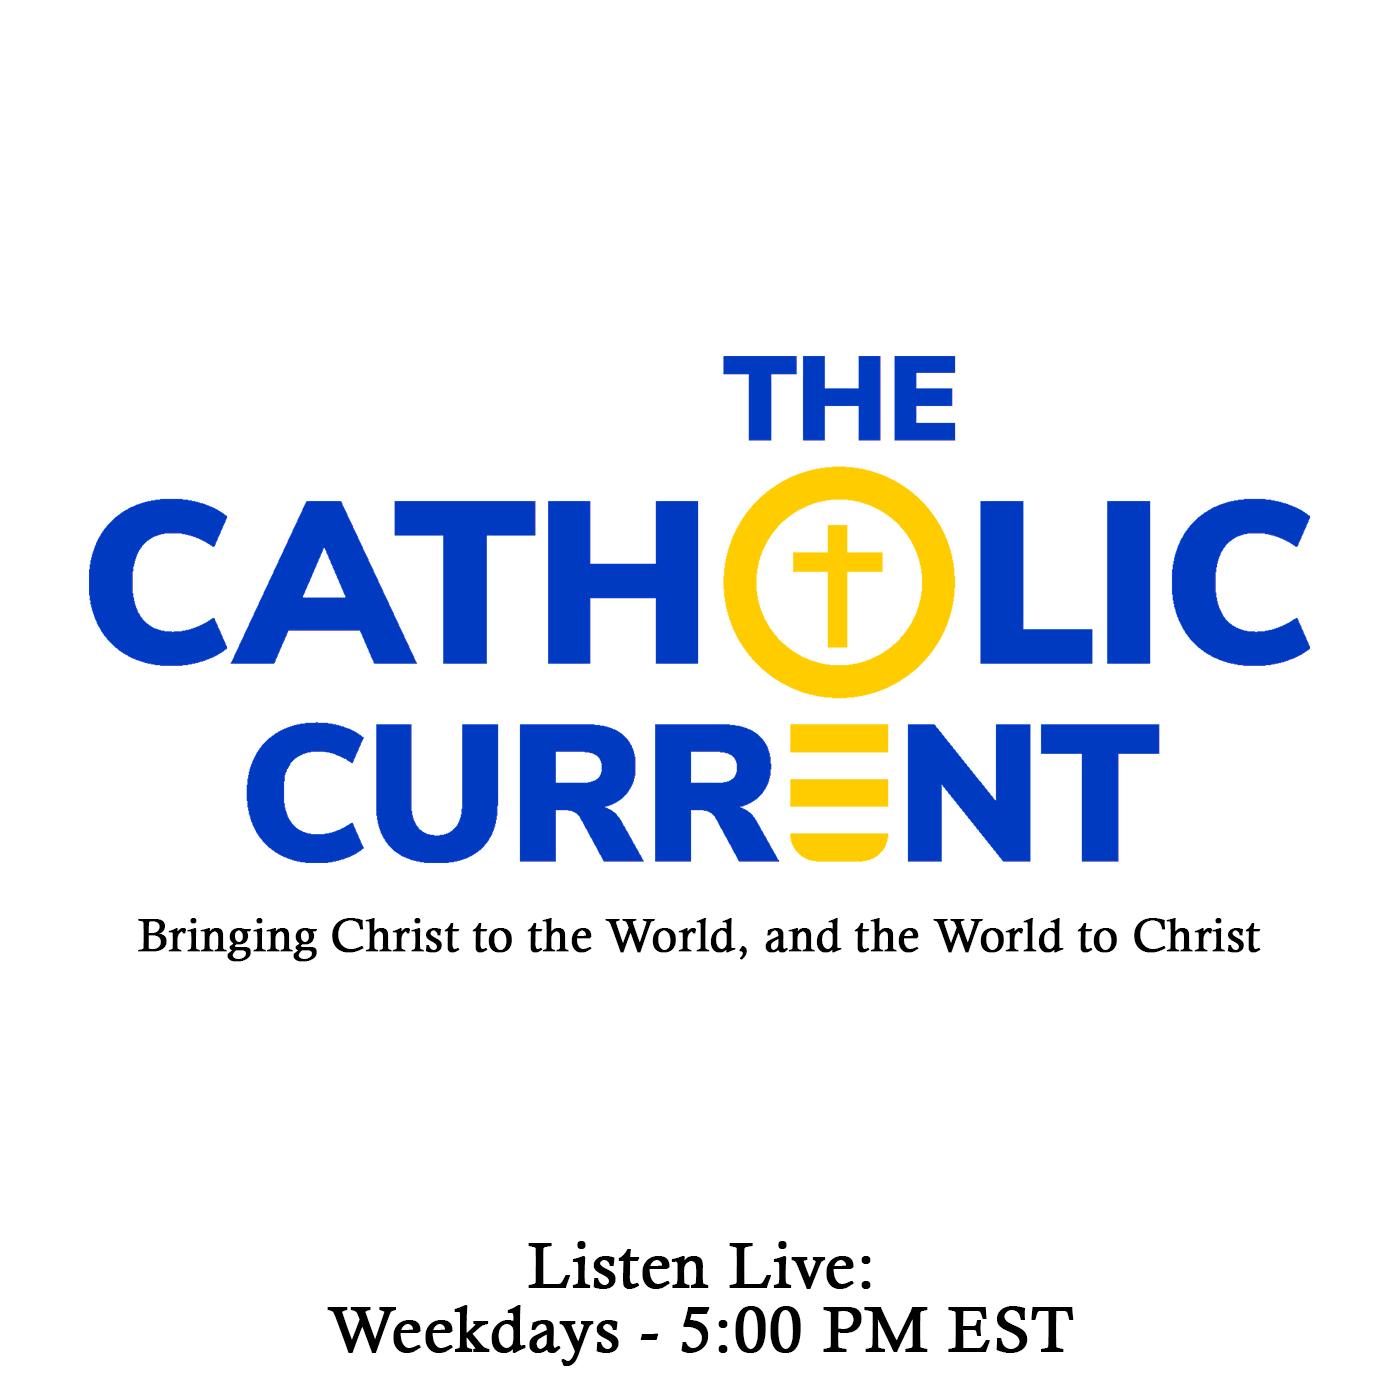 The Catholic Current show art